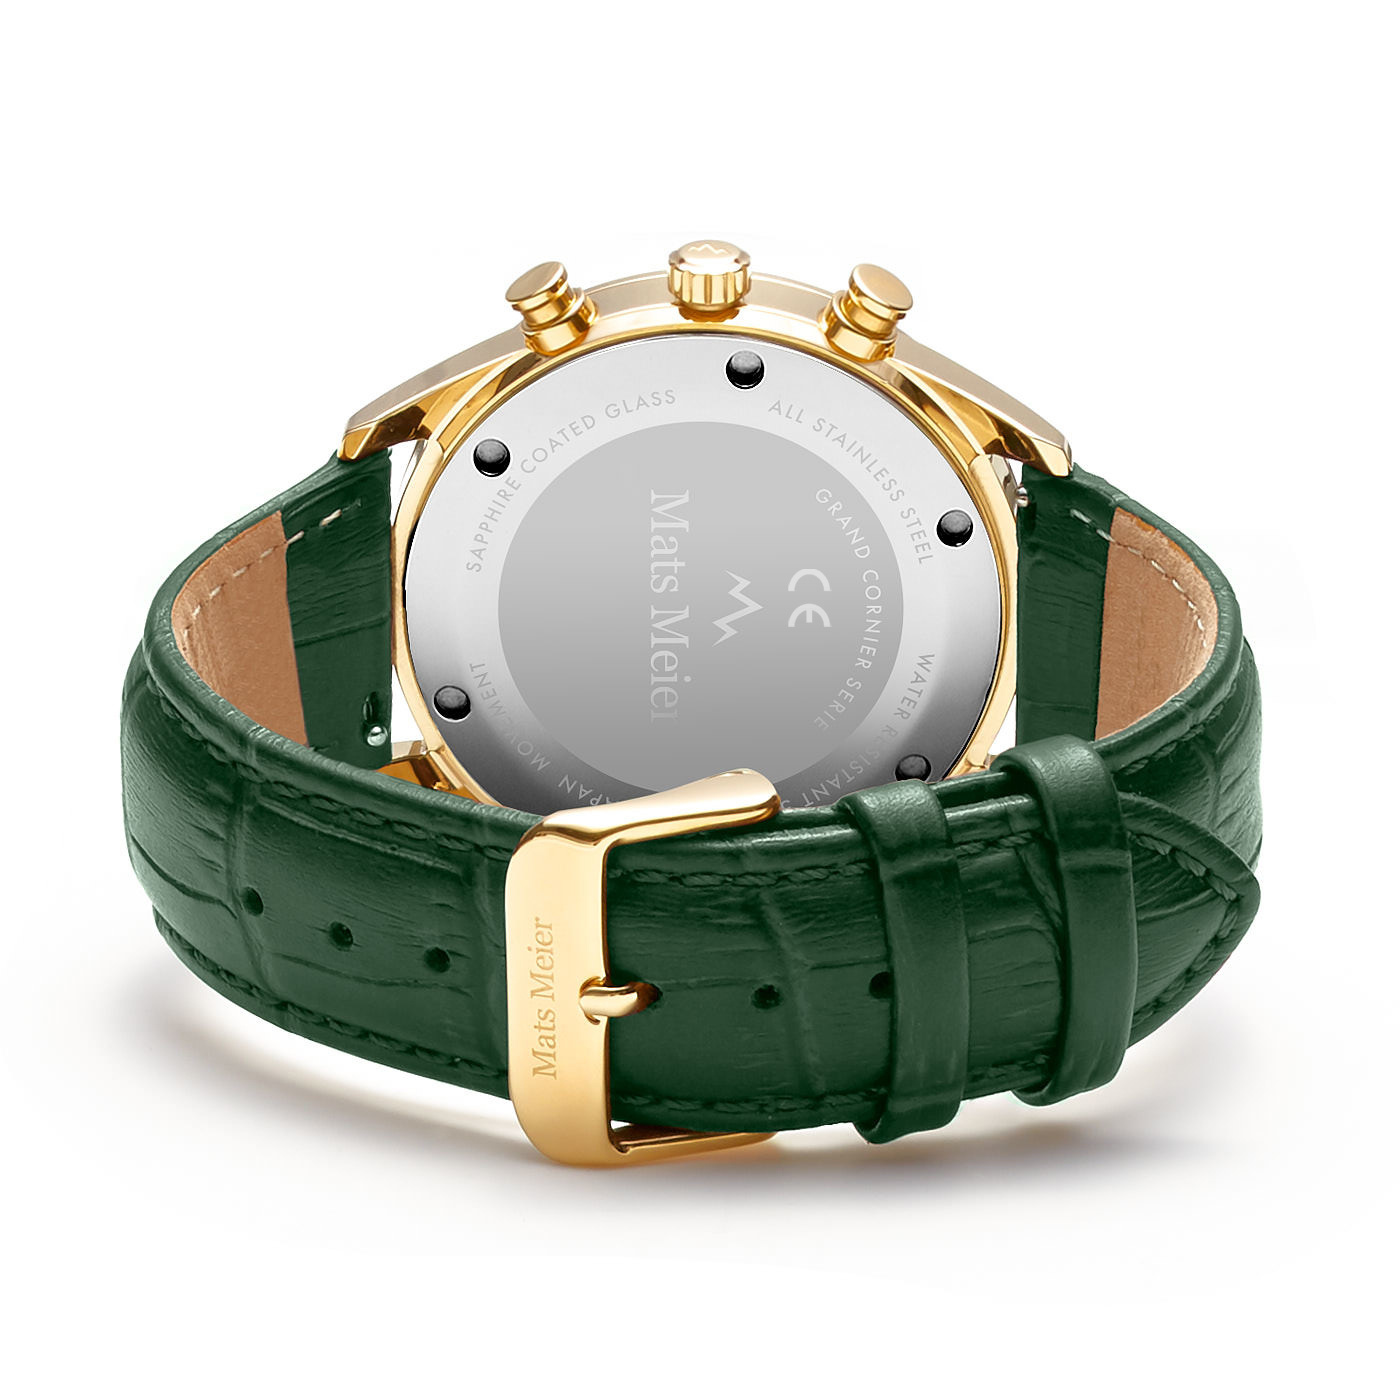 Mats Meier Grand Cornier chronograaf herenhorloge groen / goudkleurig